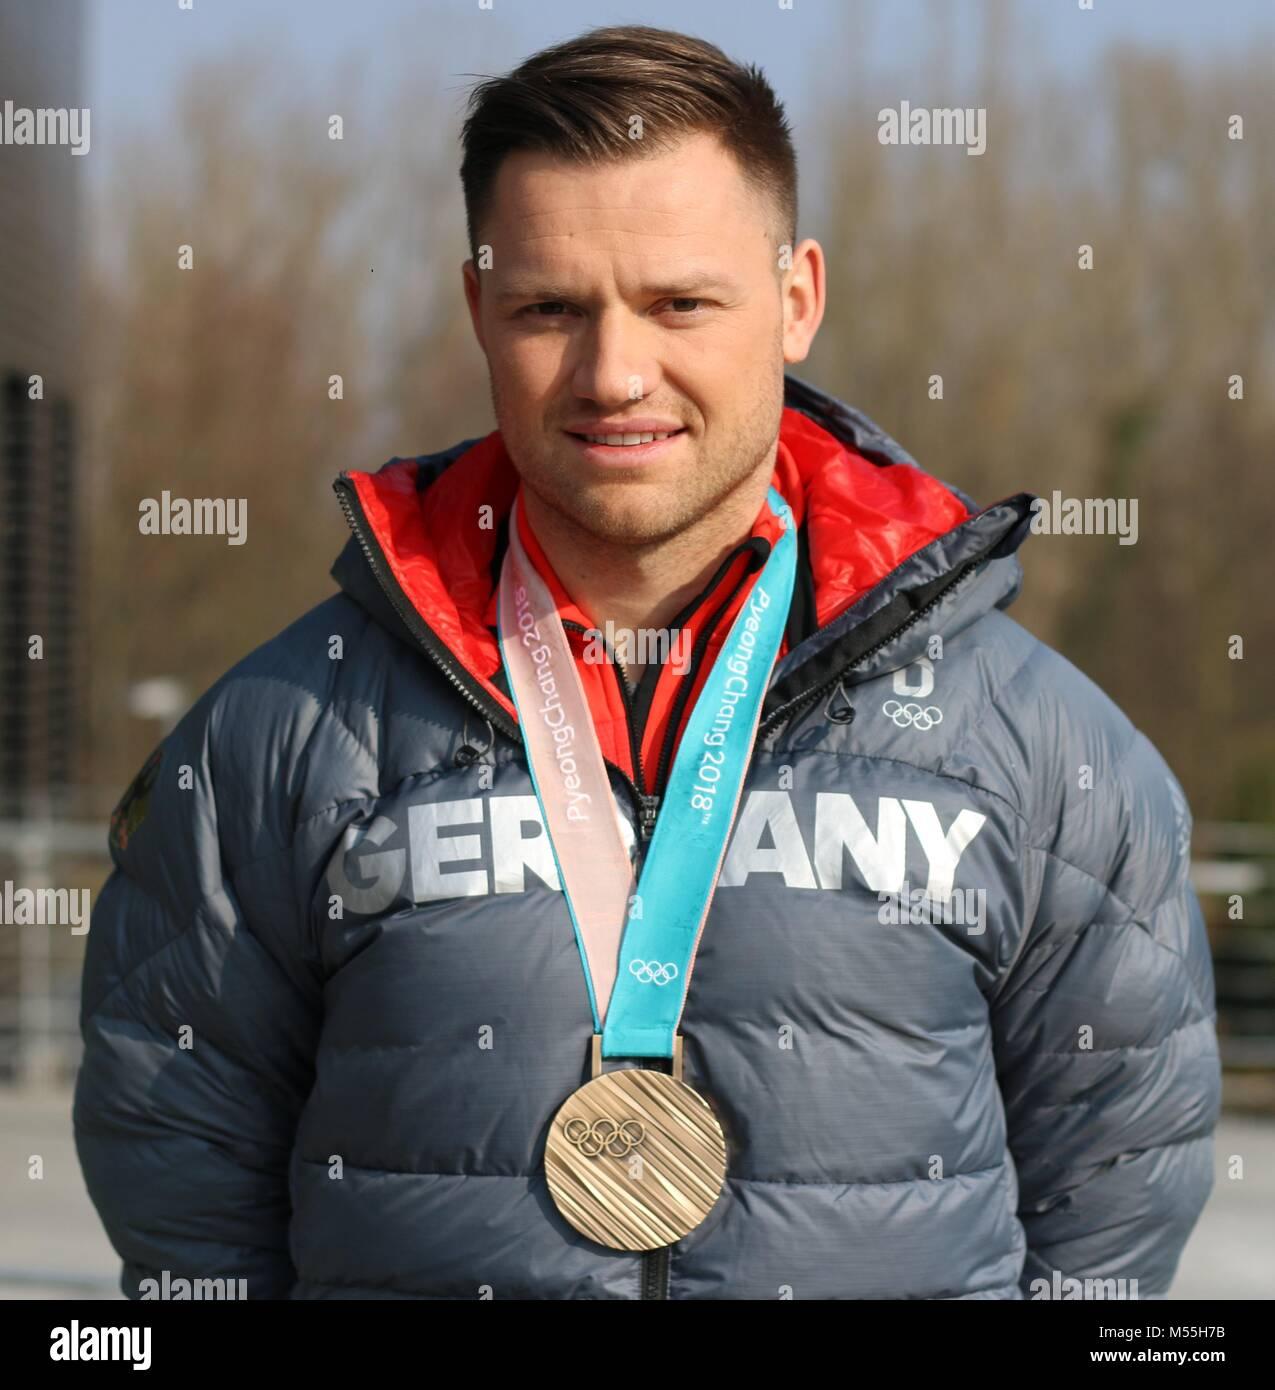 Magdeburg, Germany - February 20,2018: German luge athlete Toni Eggert visits Magdeburg after returning from Pyeongchang. - Stock Image